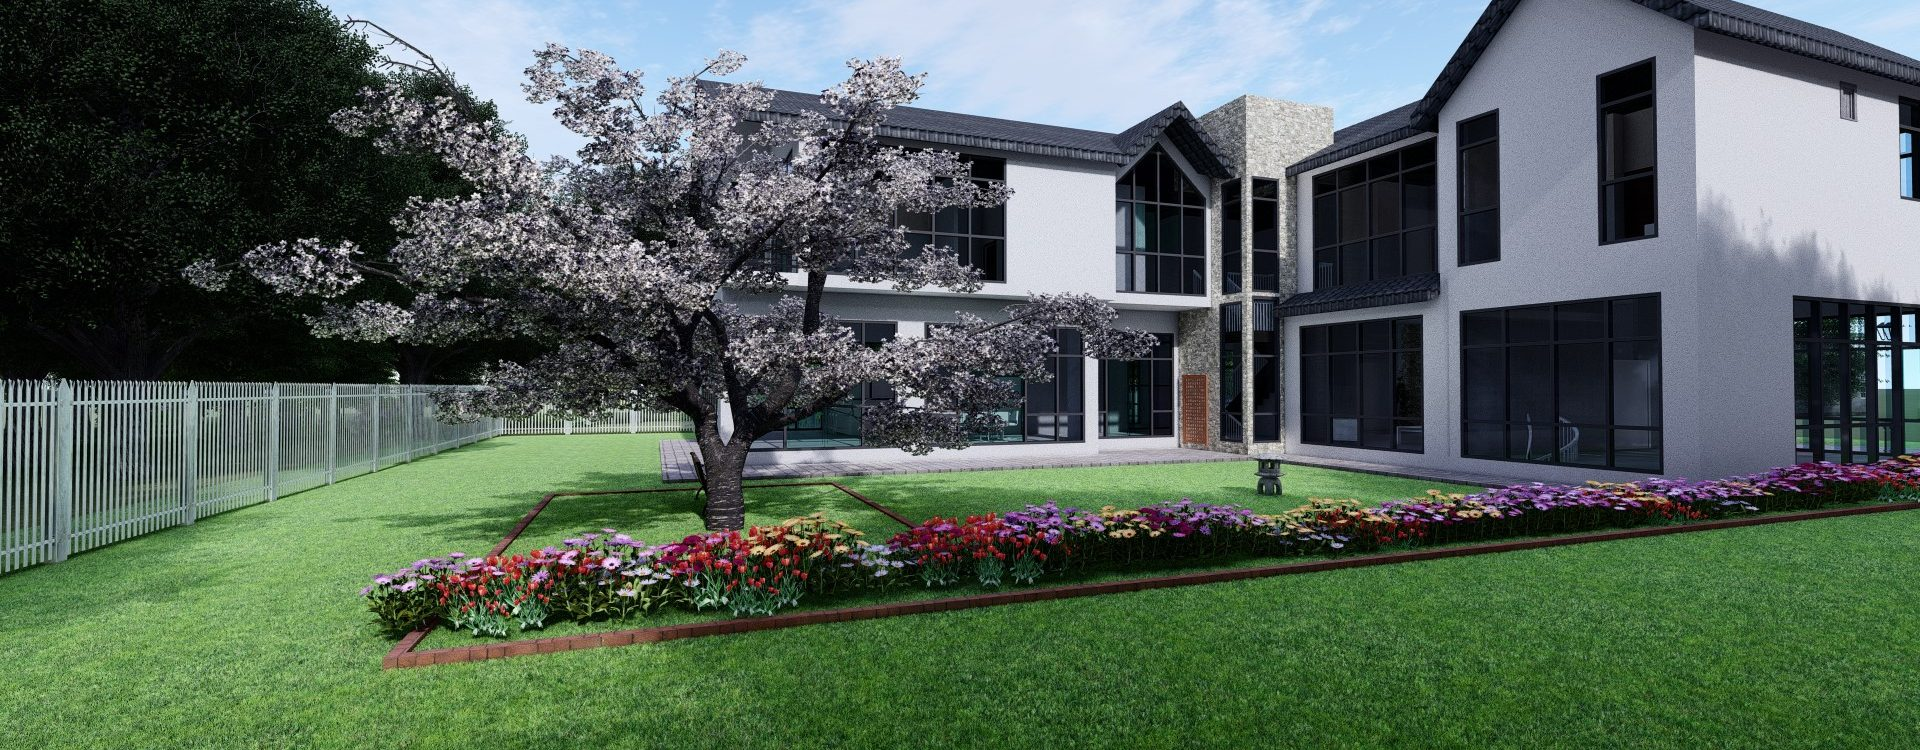 New building design Beverly Hills, CA 2